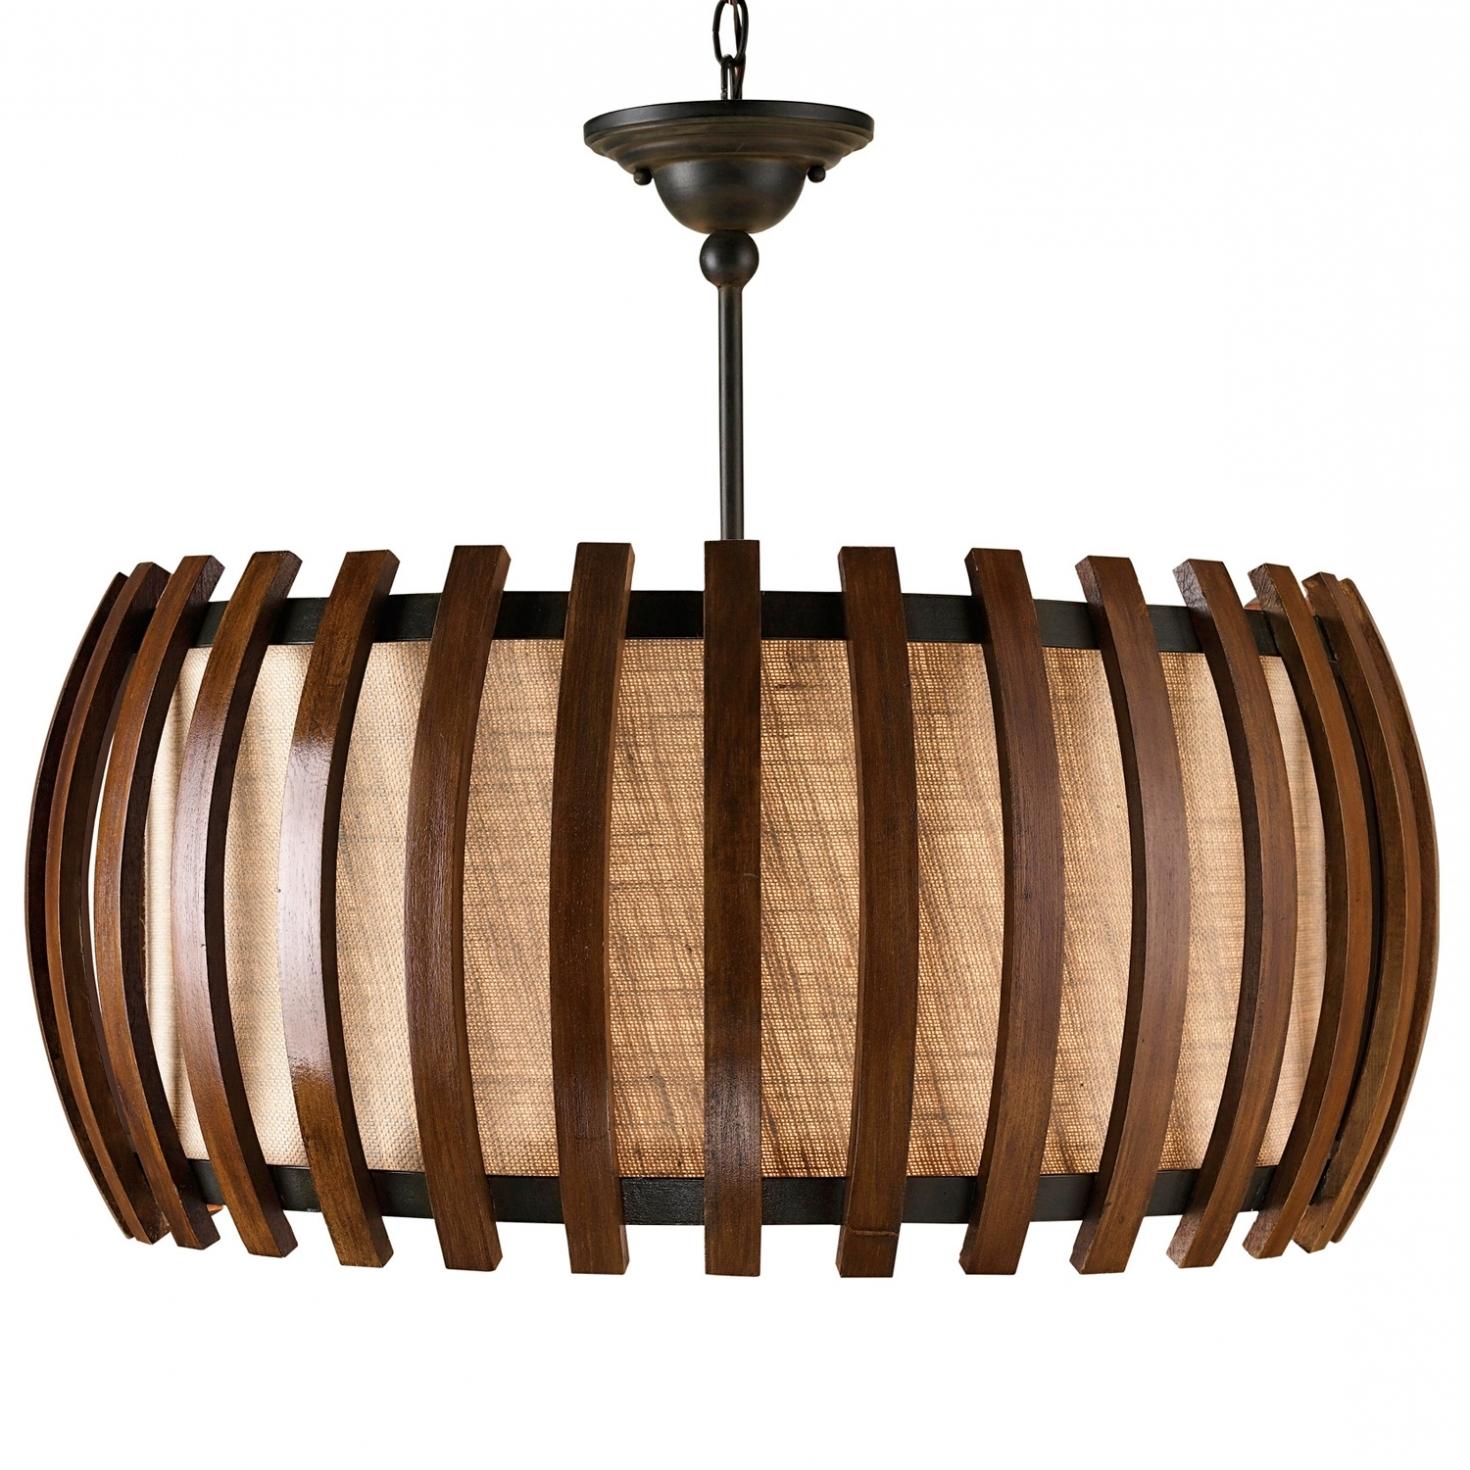 Modern Wooden Chandeliers – Chandelier Designs Regarding Well Known Wooden Chandeliers (View 7 of 20)